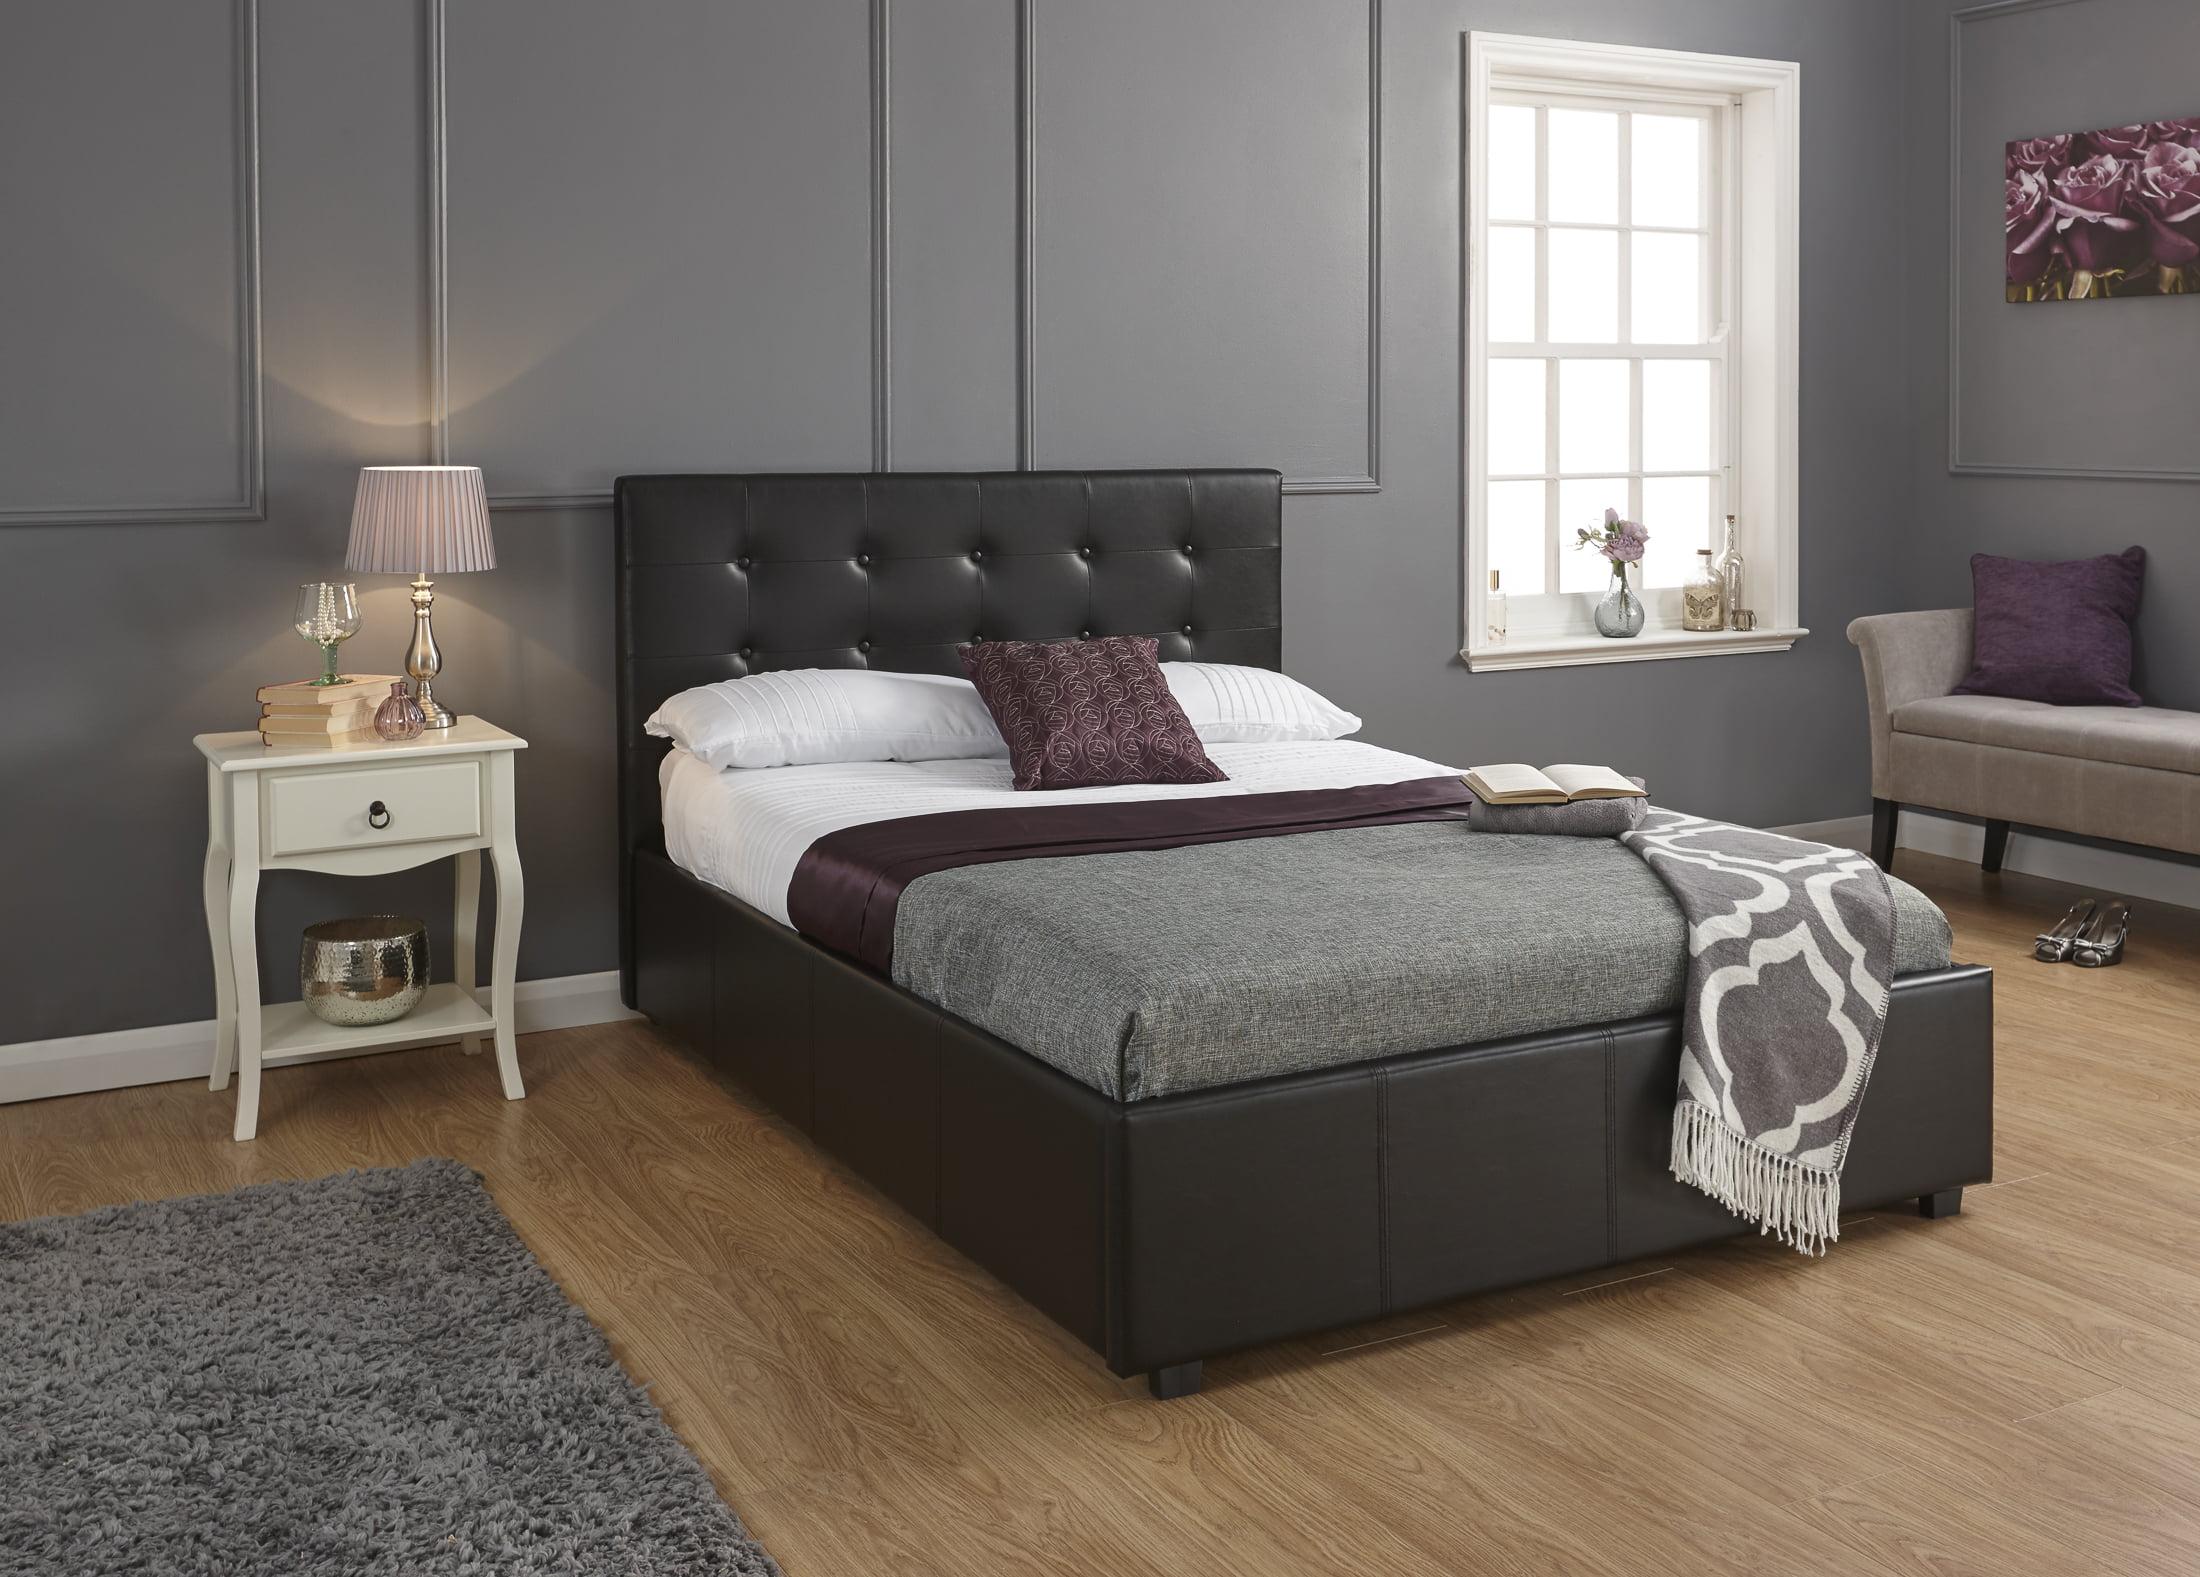 Montana Ottoman Bed Frame - BigMickey.ie